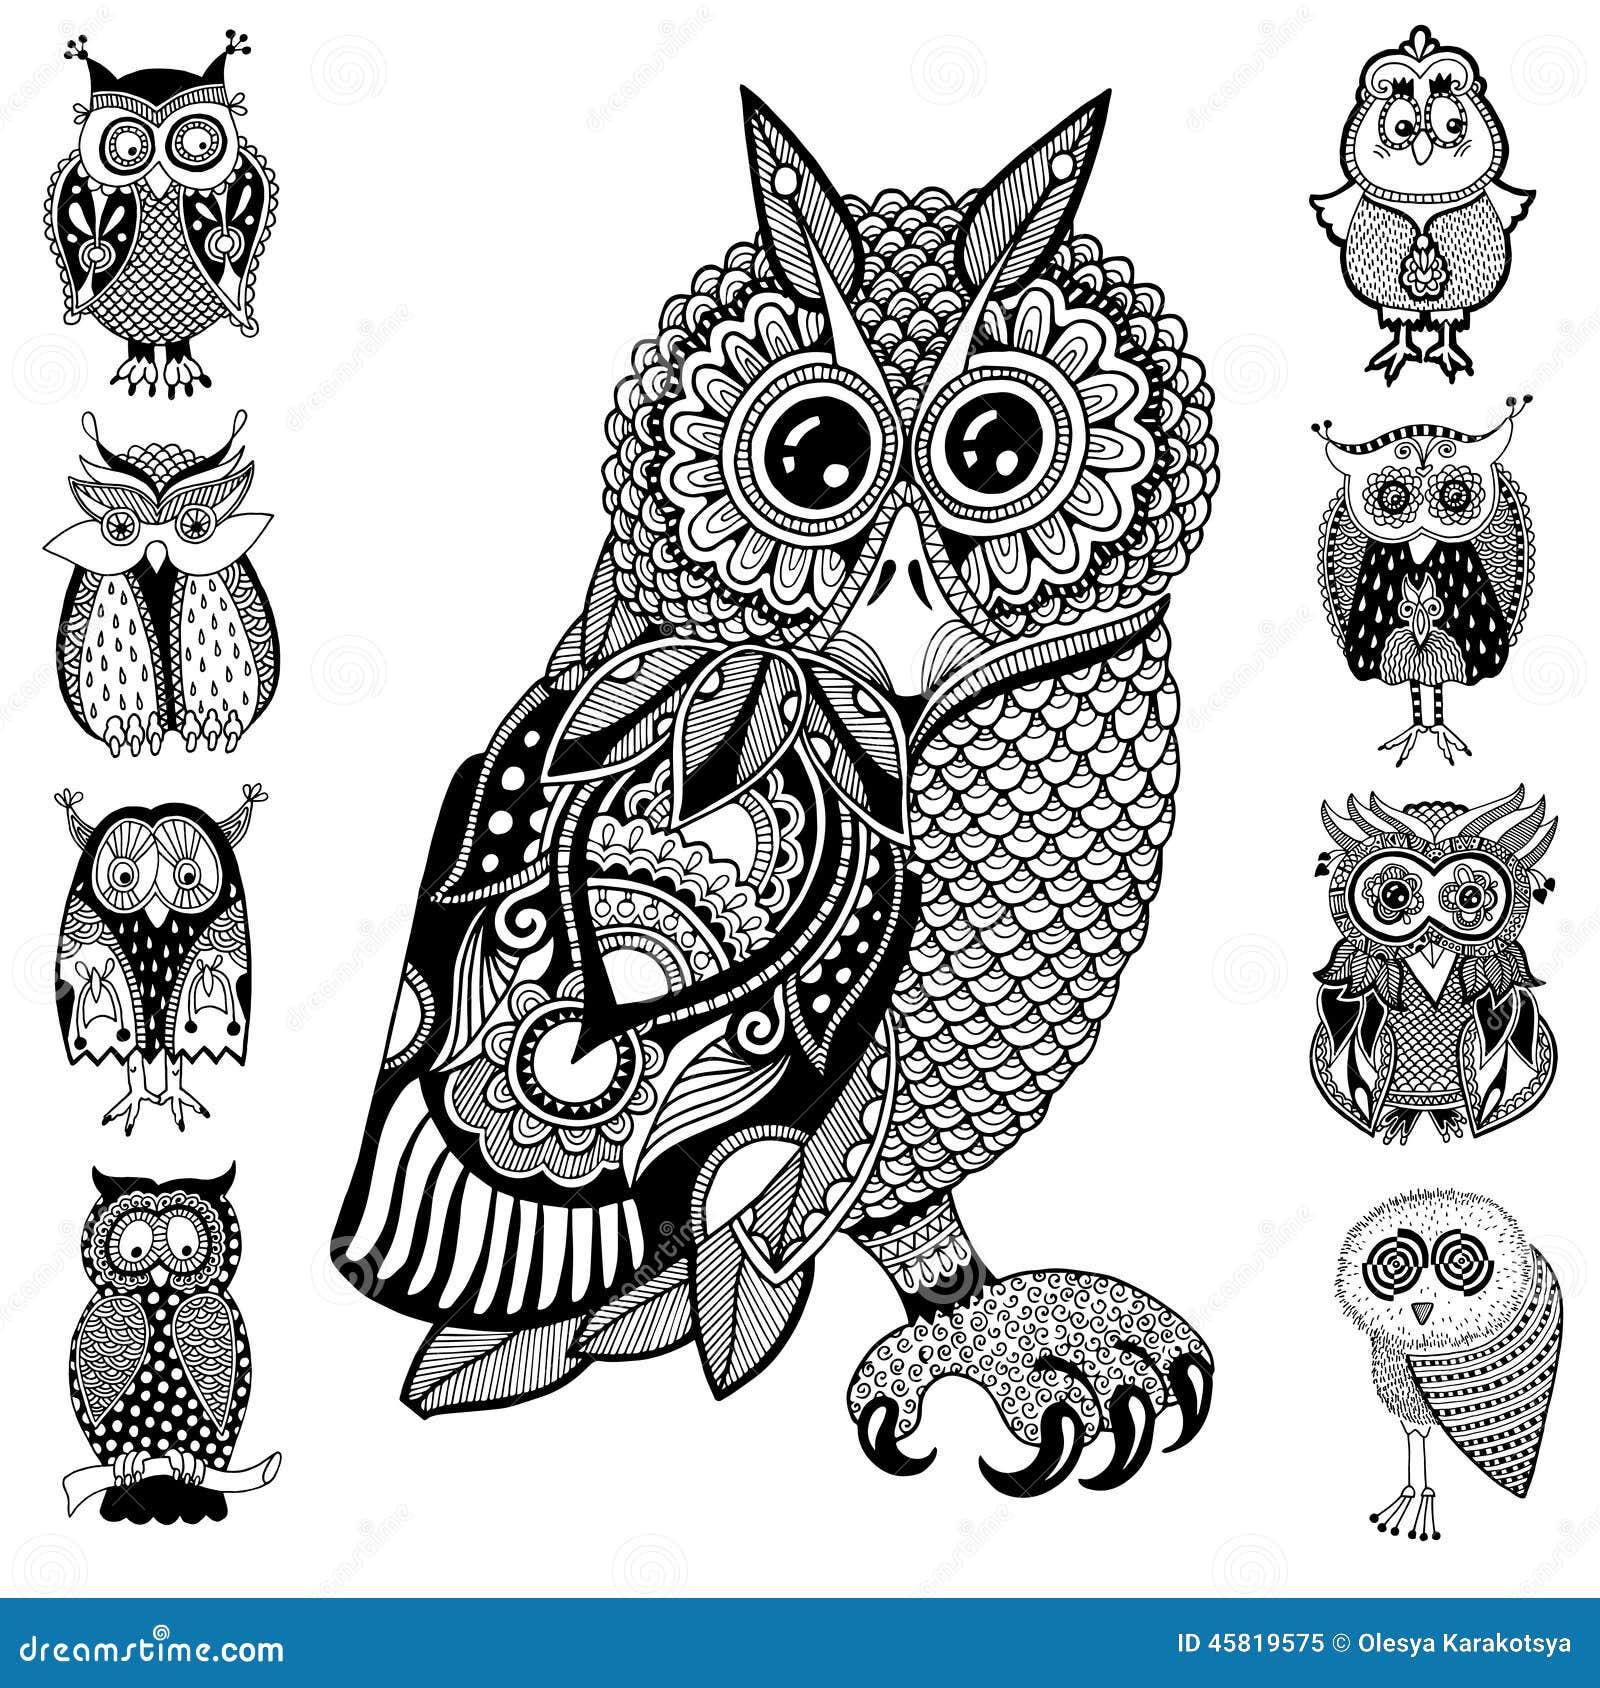 Original Artwork Of Owl Ink Hand Drawing In Stock Vector